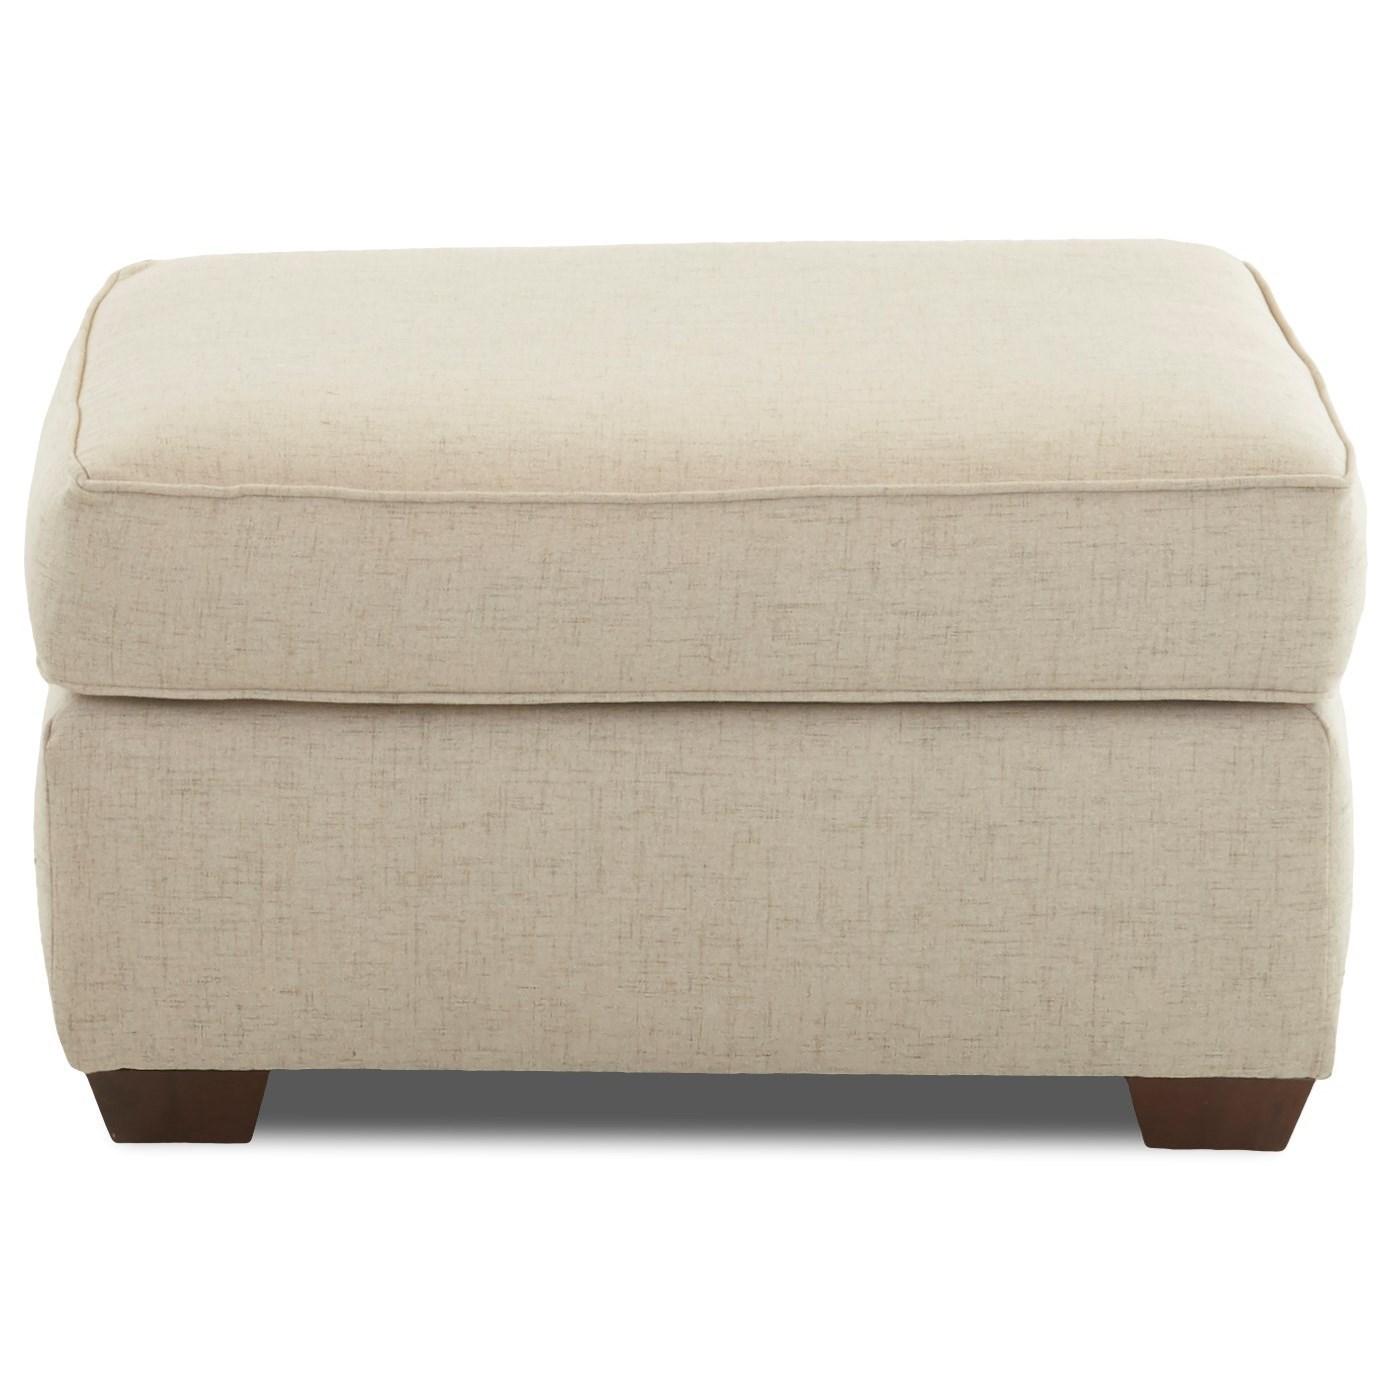 Hybrid Chair Ottoman by Klaussner at Lapeer Furniture & Mattress Center